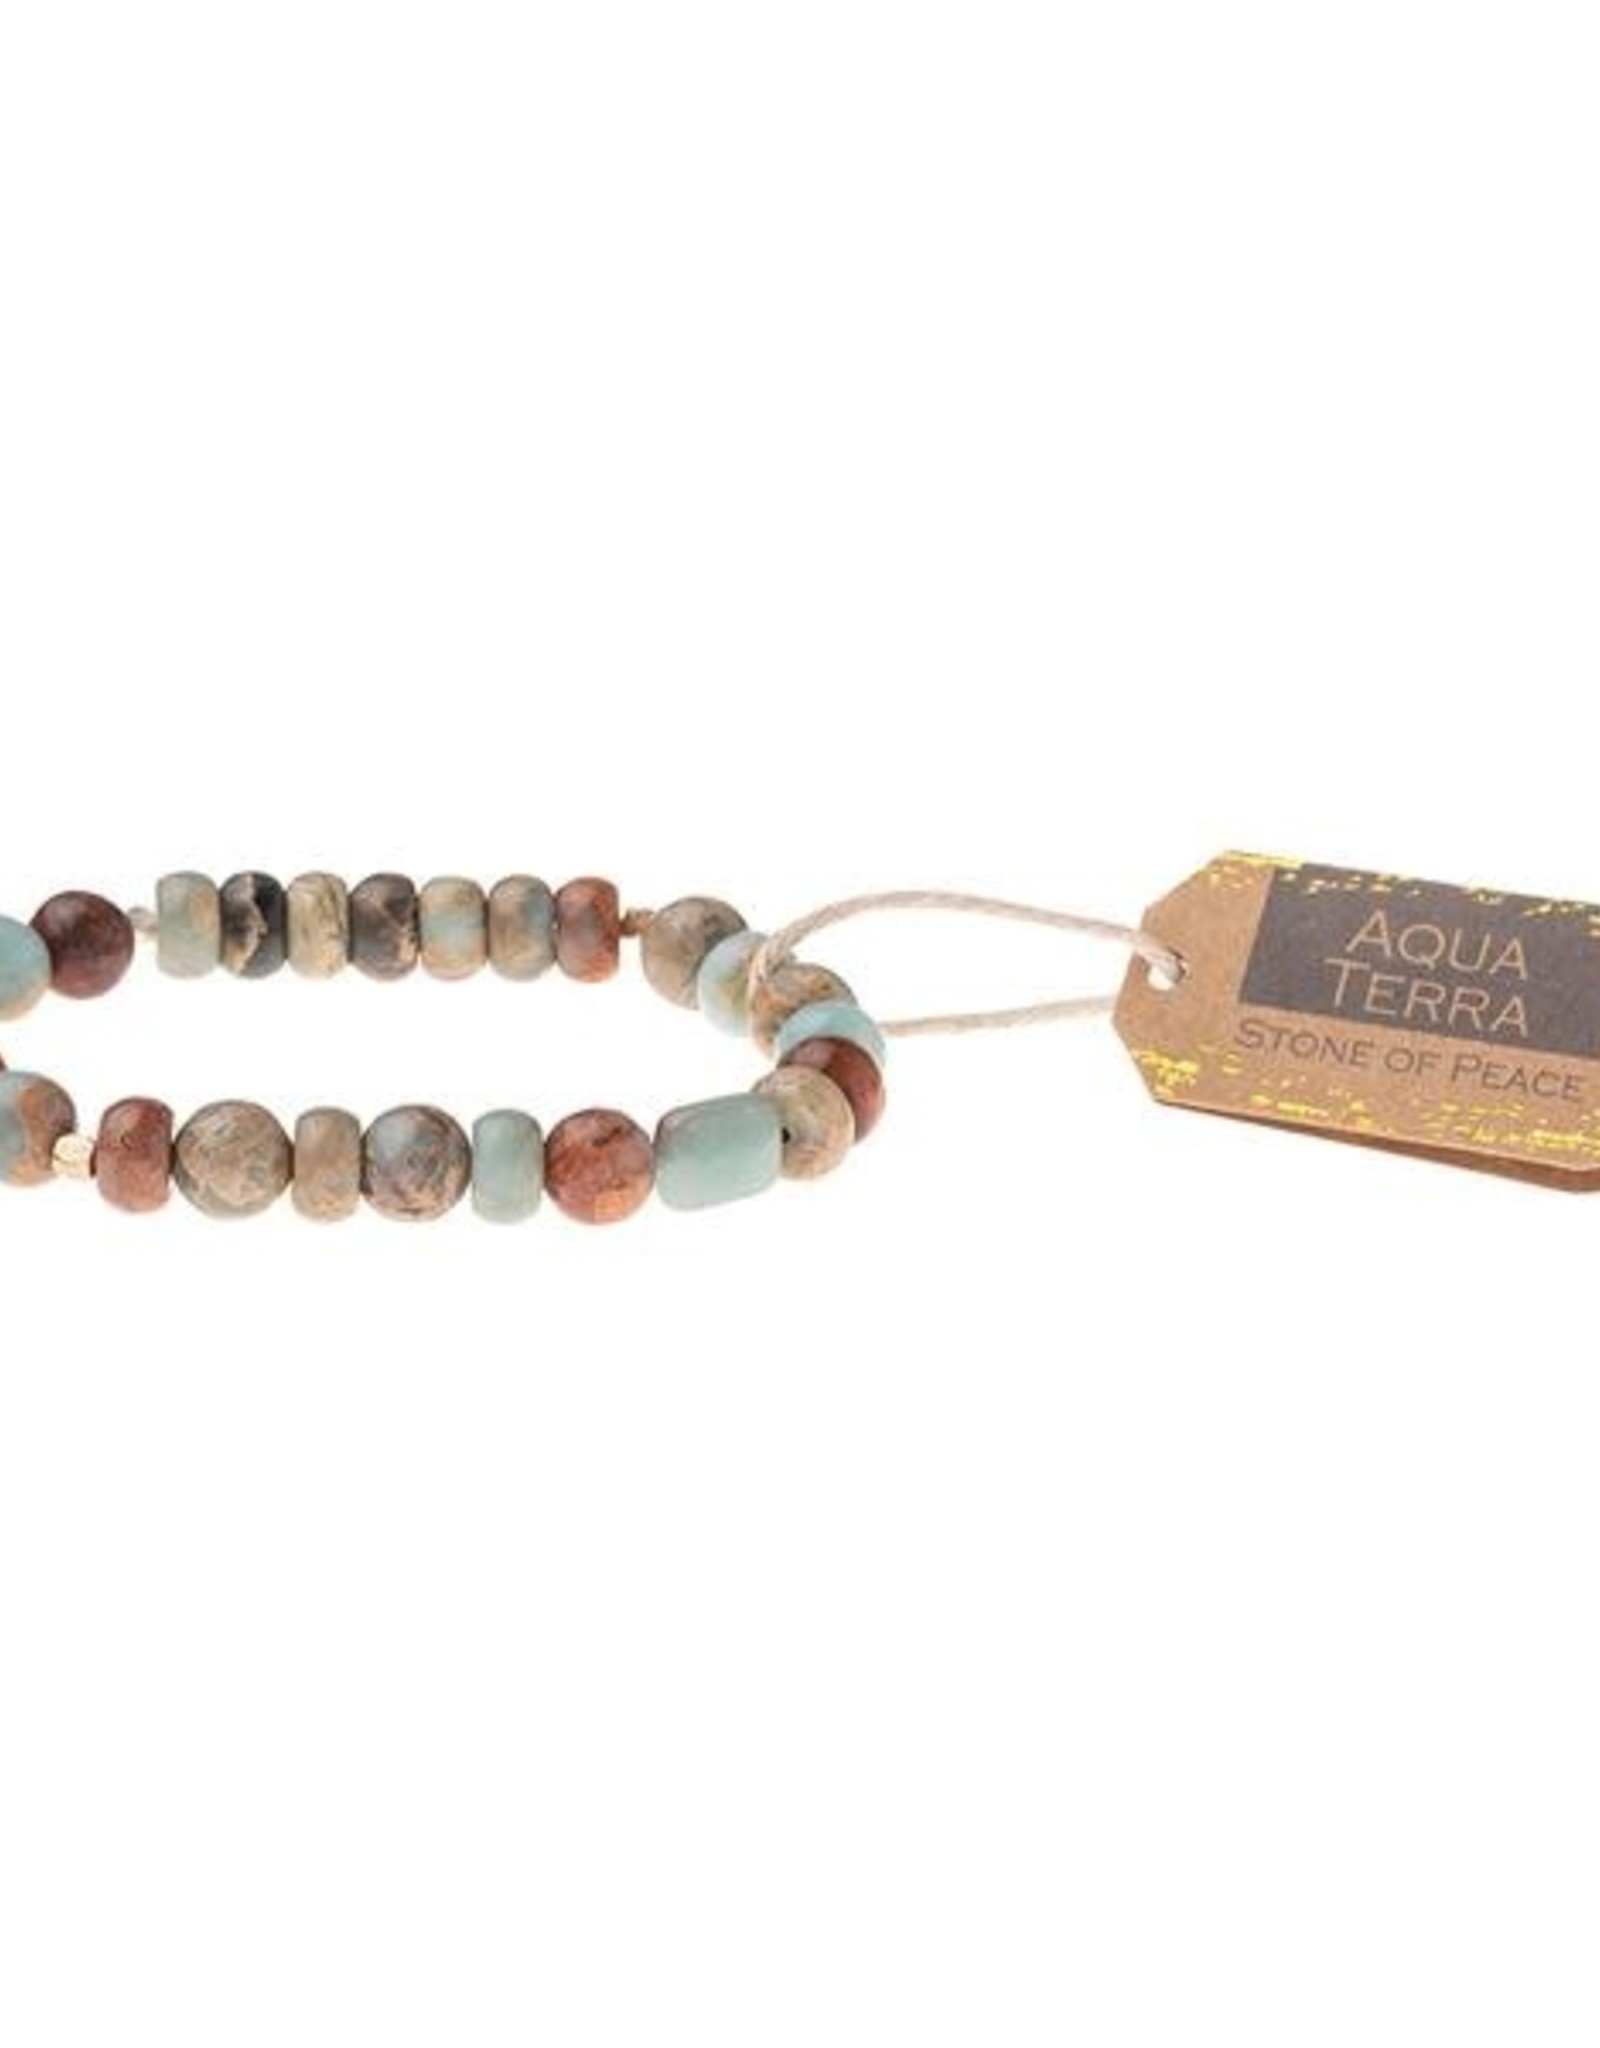 Scout Stone Bracelet - Aqua Terra